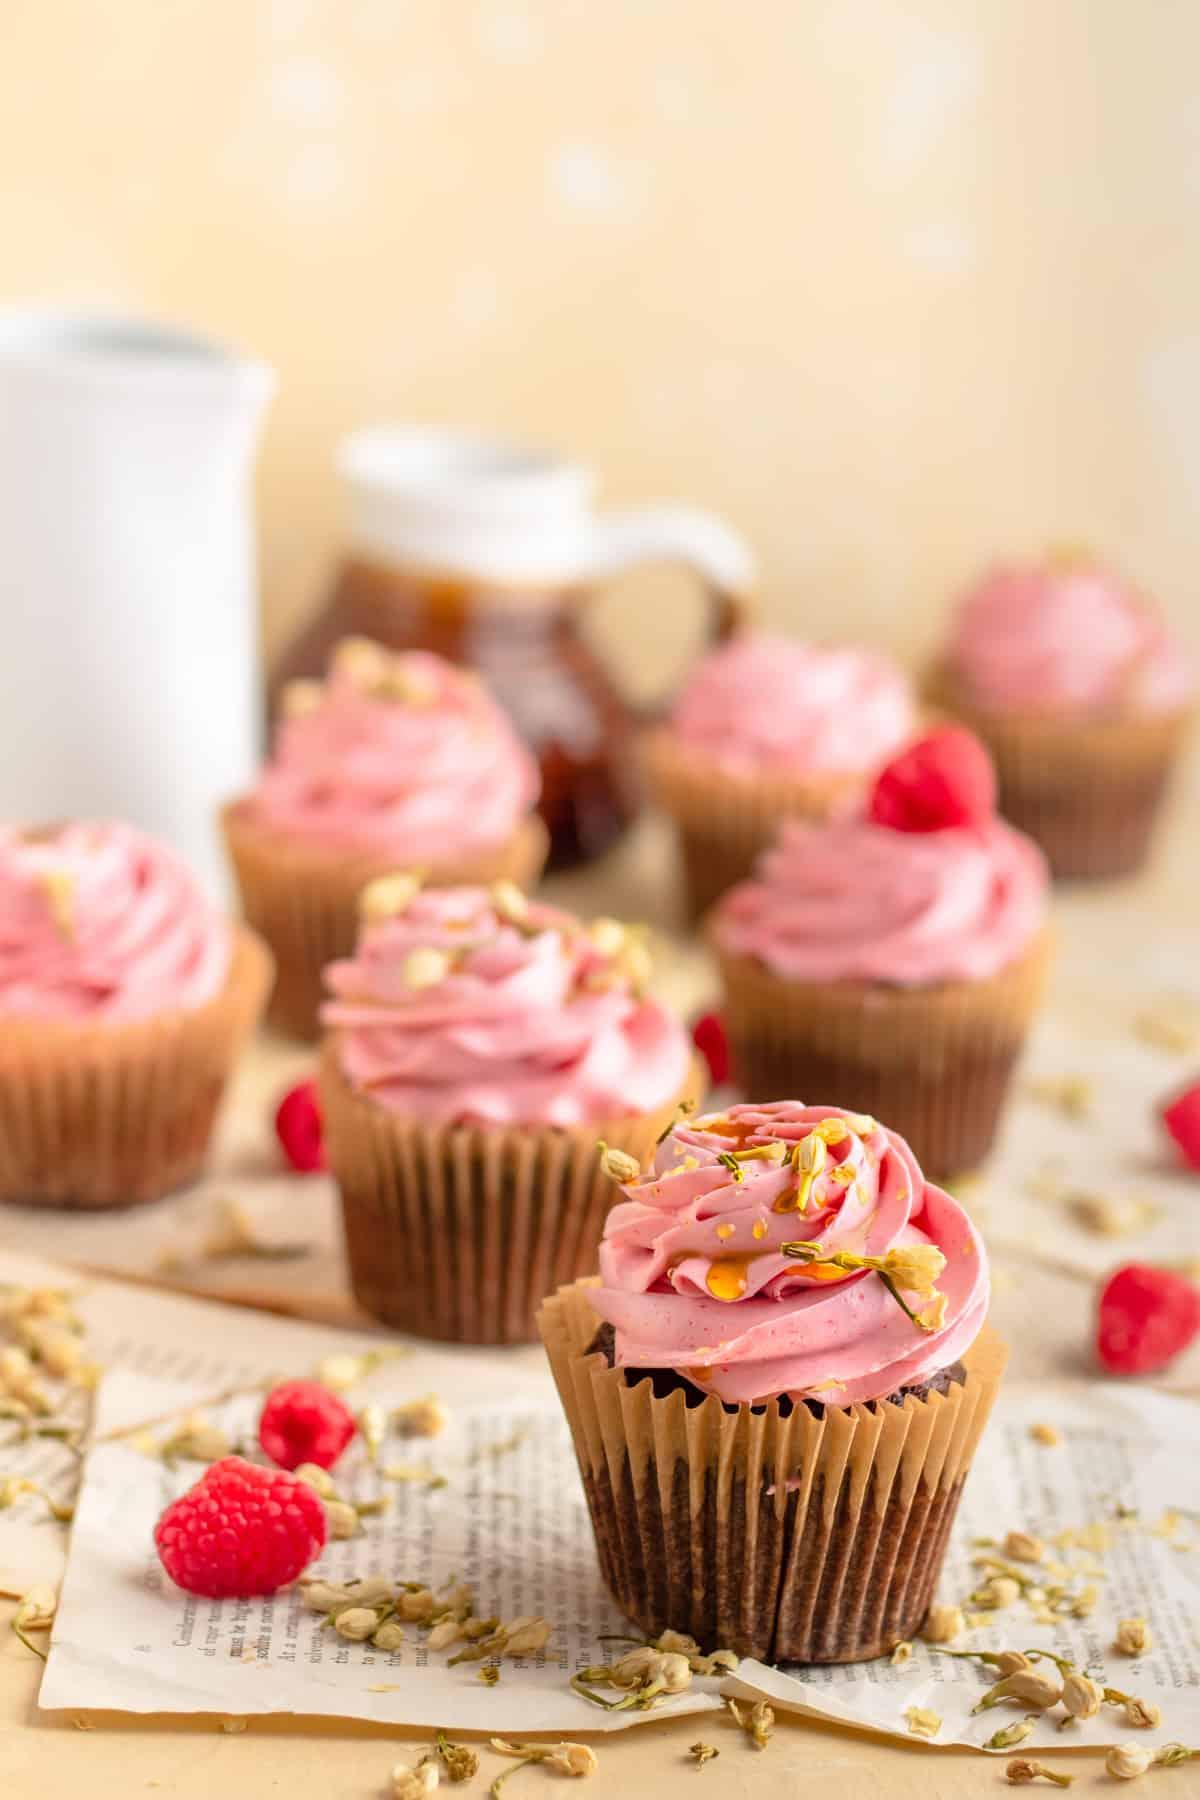 Chocolate Honey and Raspberry Cupcakes